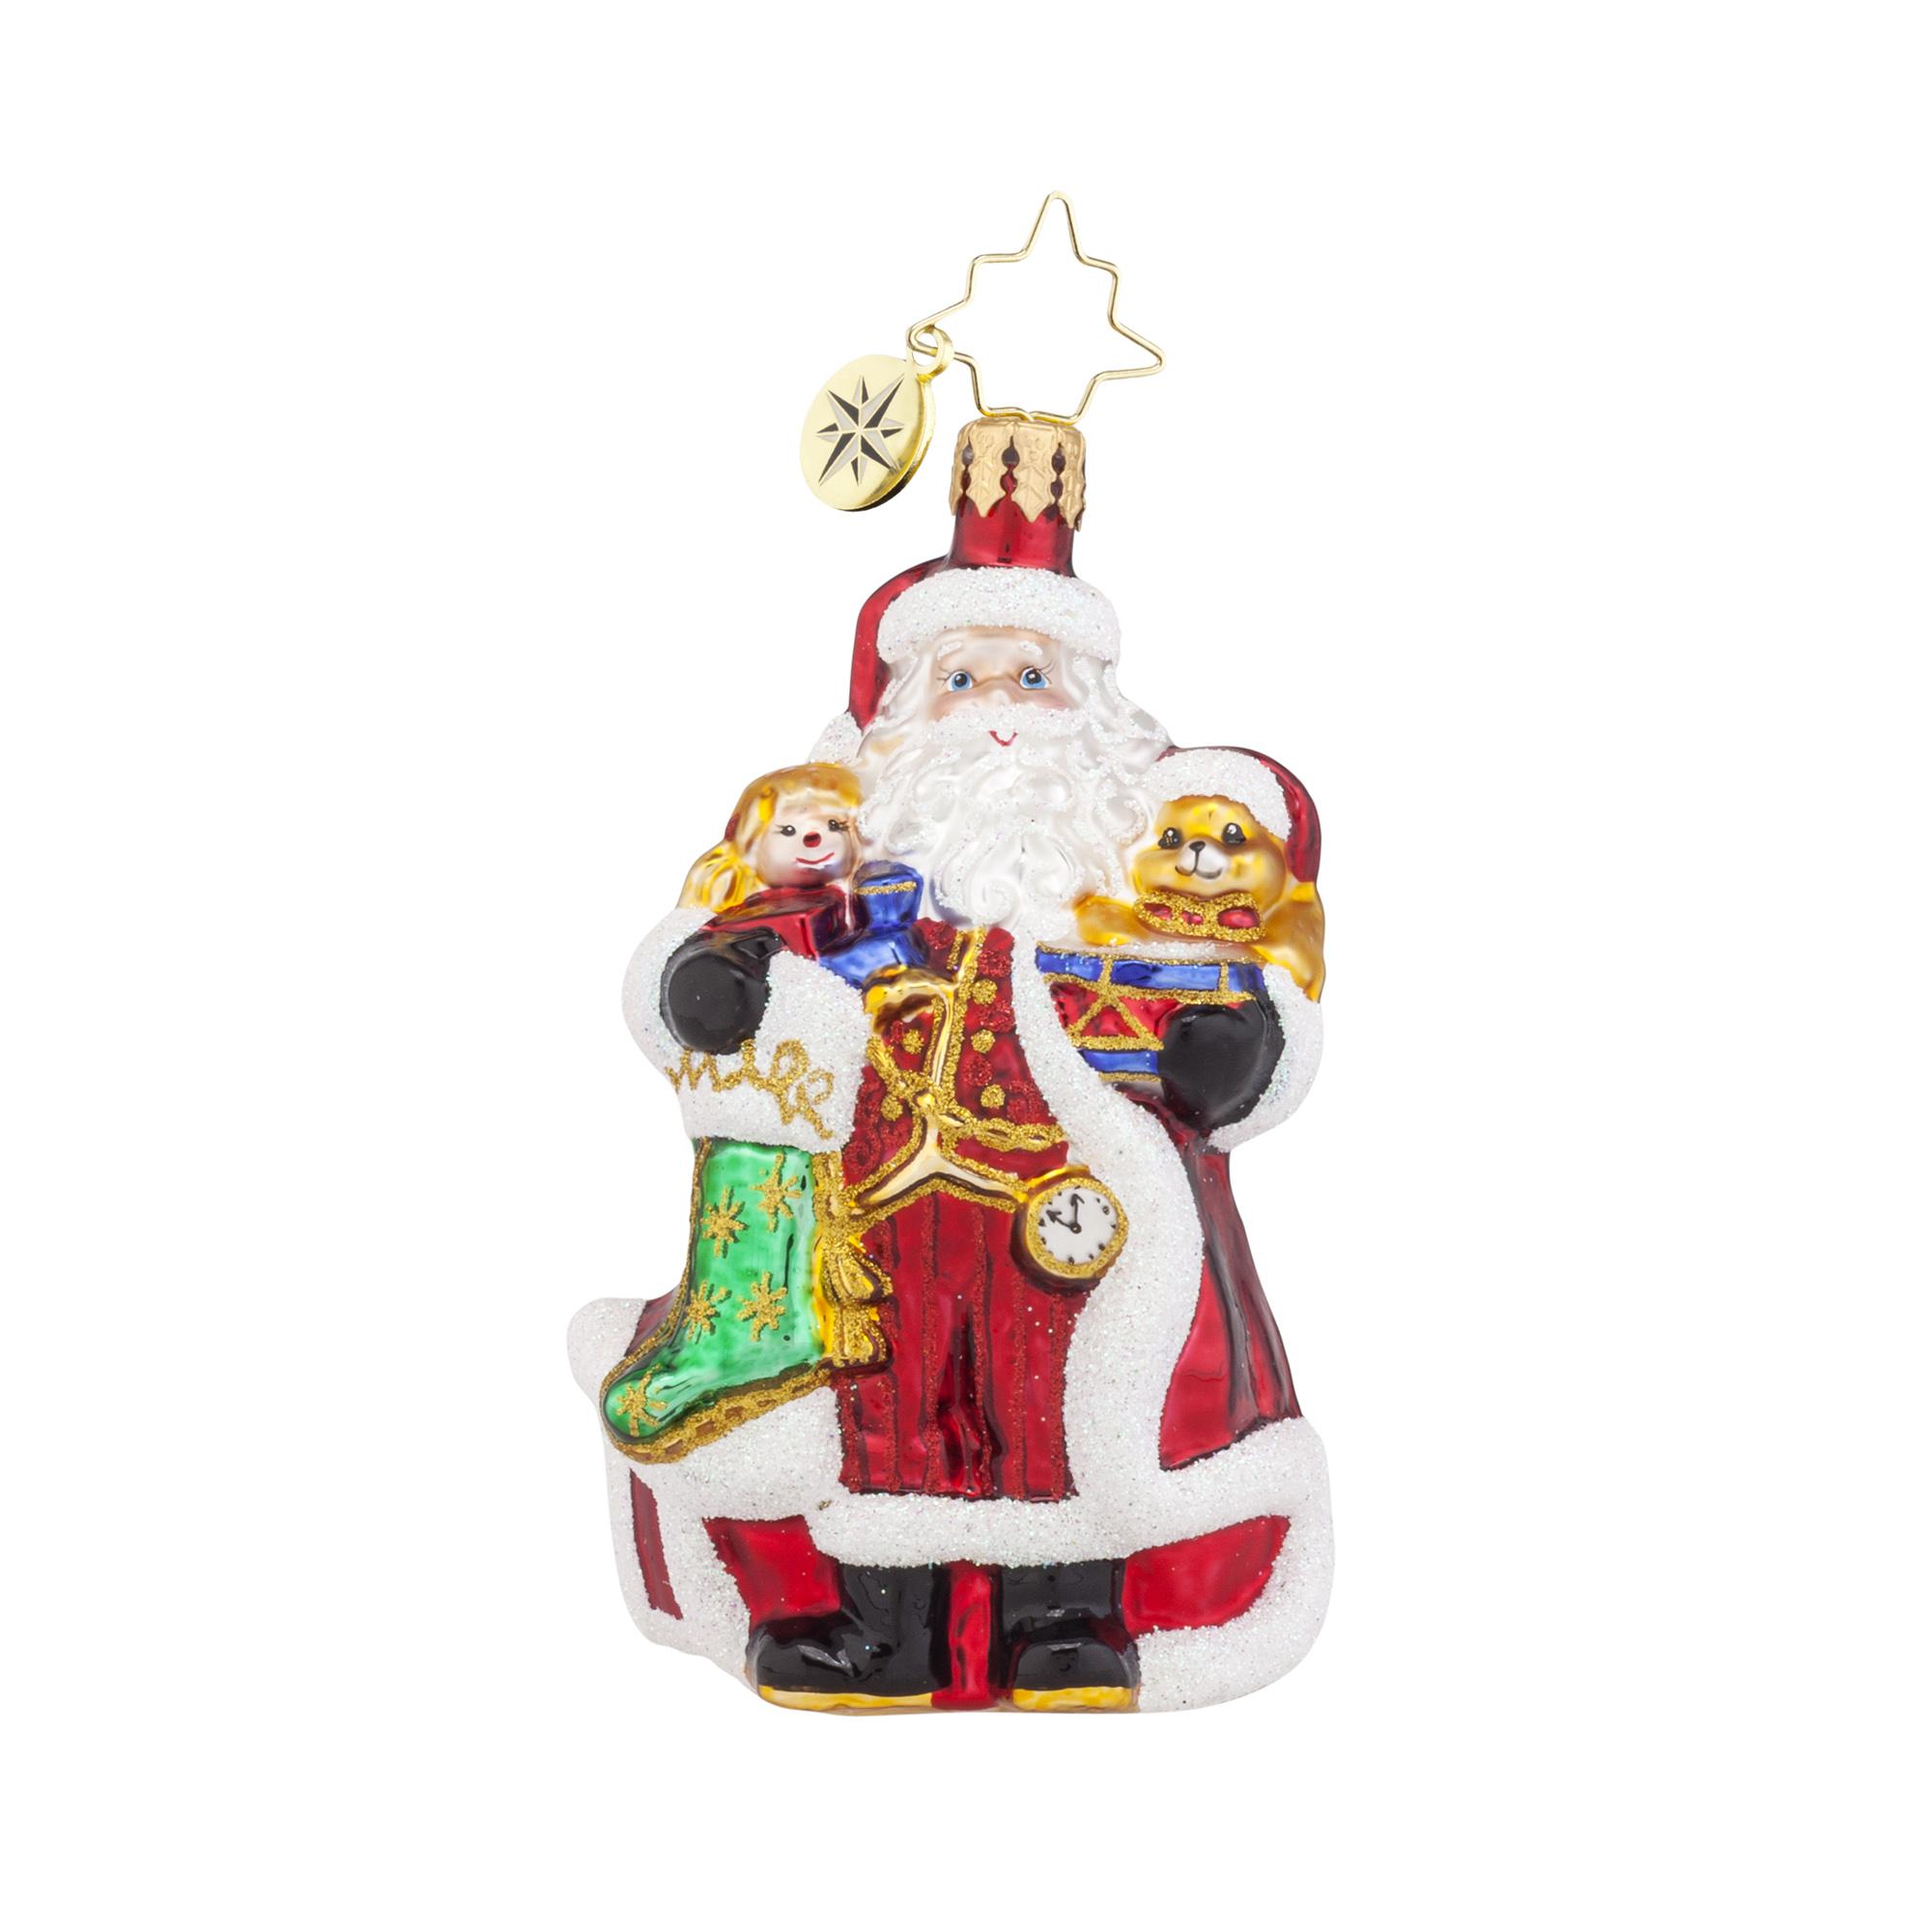 Christmas Toys 2015 : Radko a christmas classic gem santa with gifts